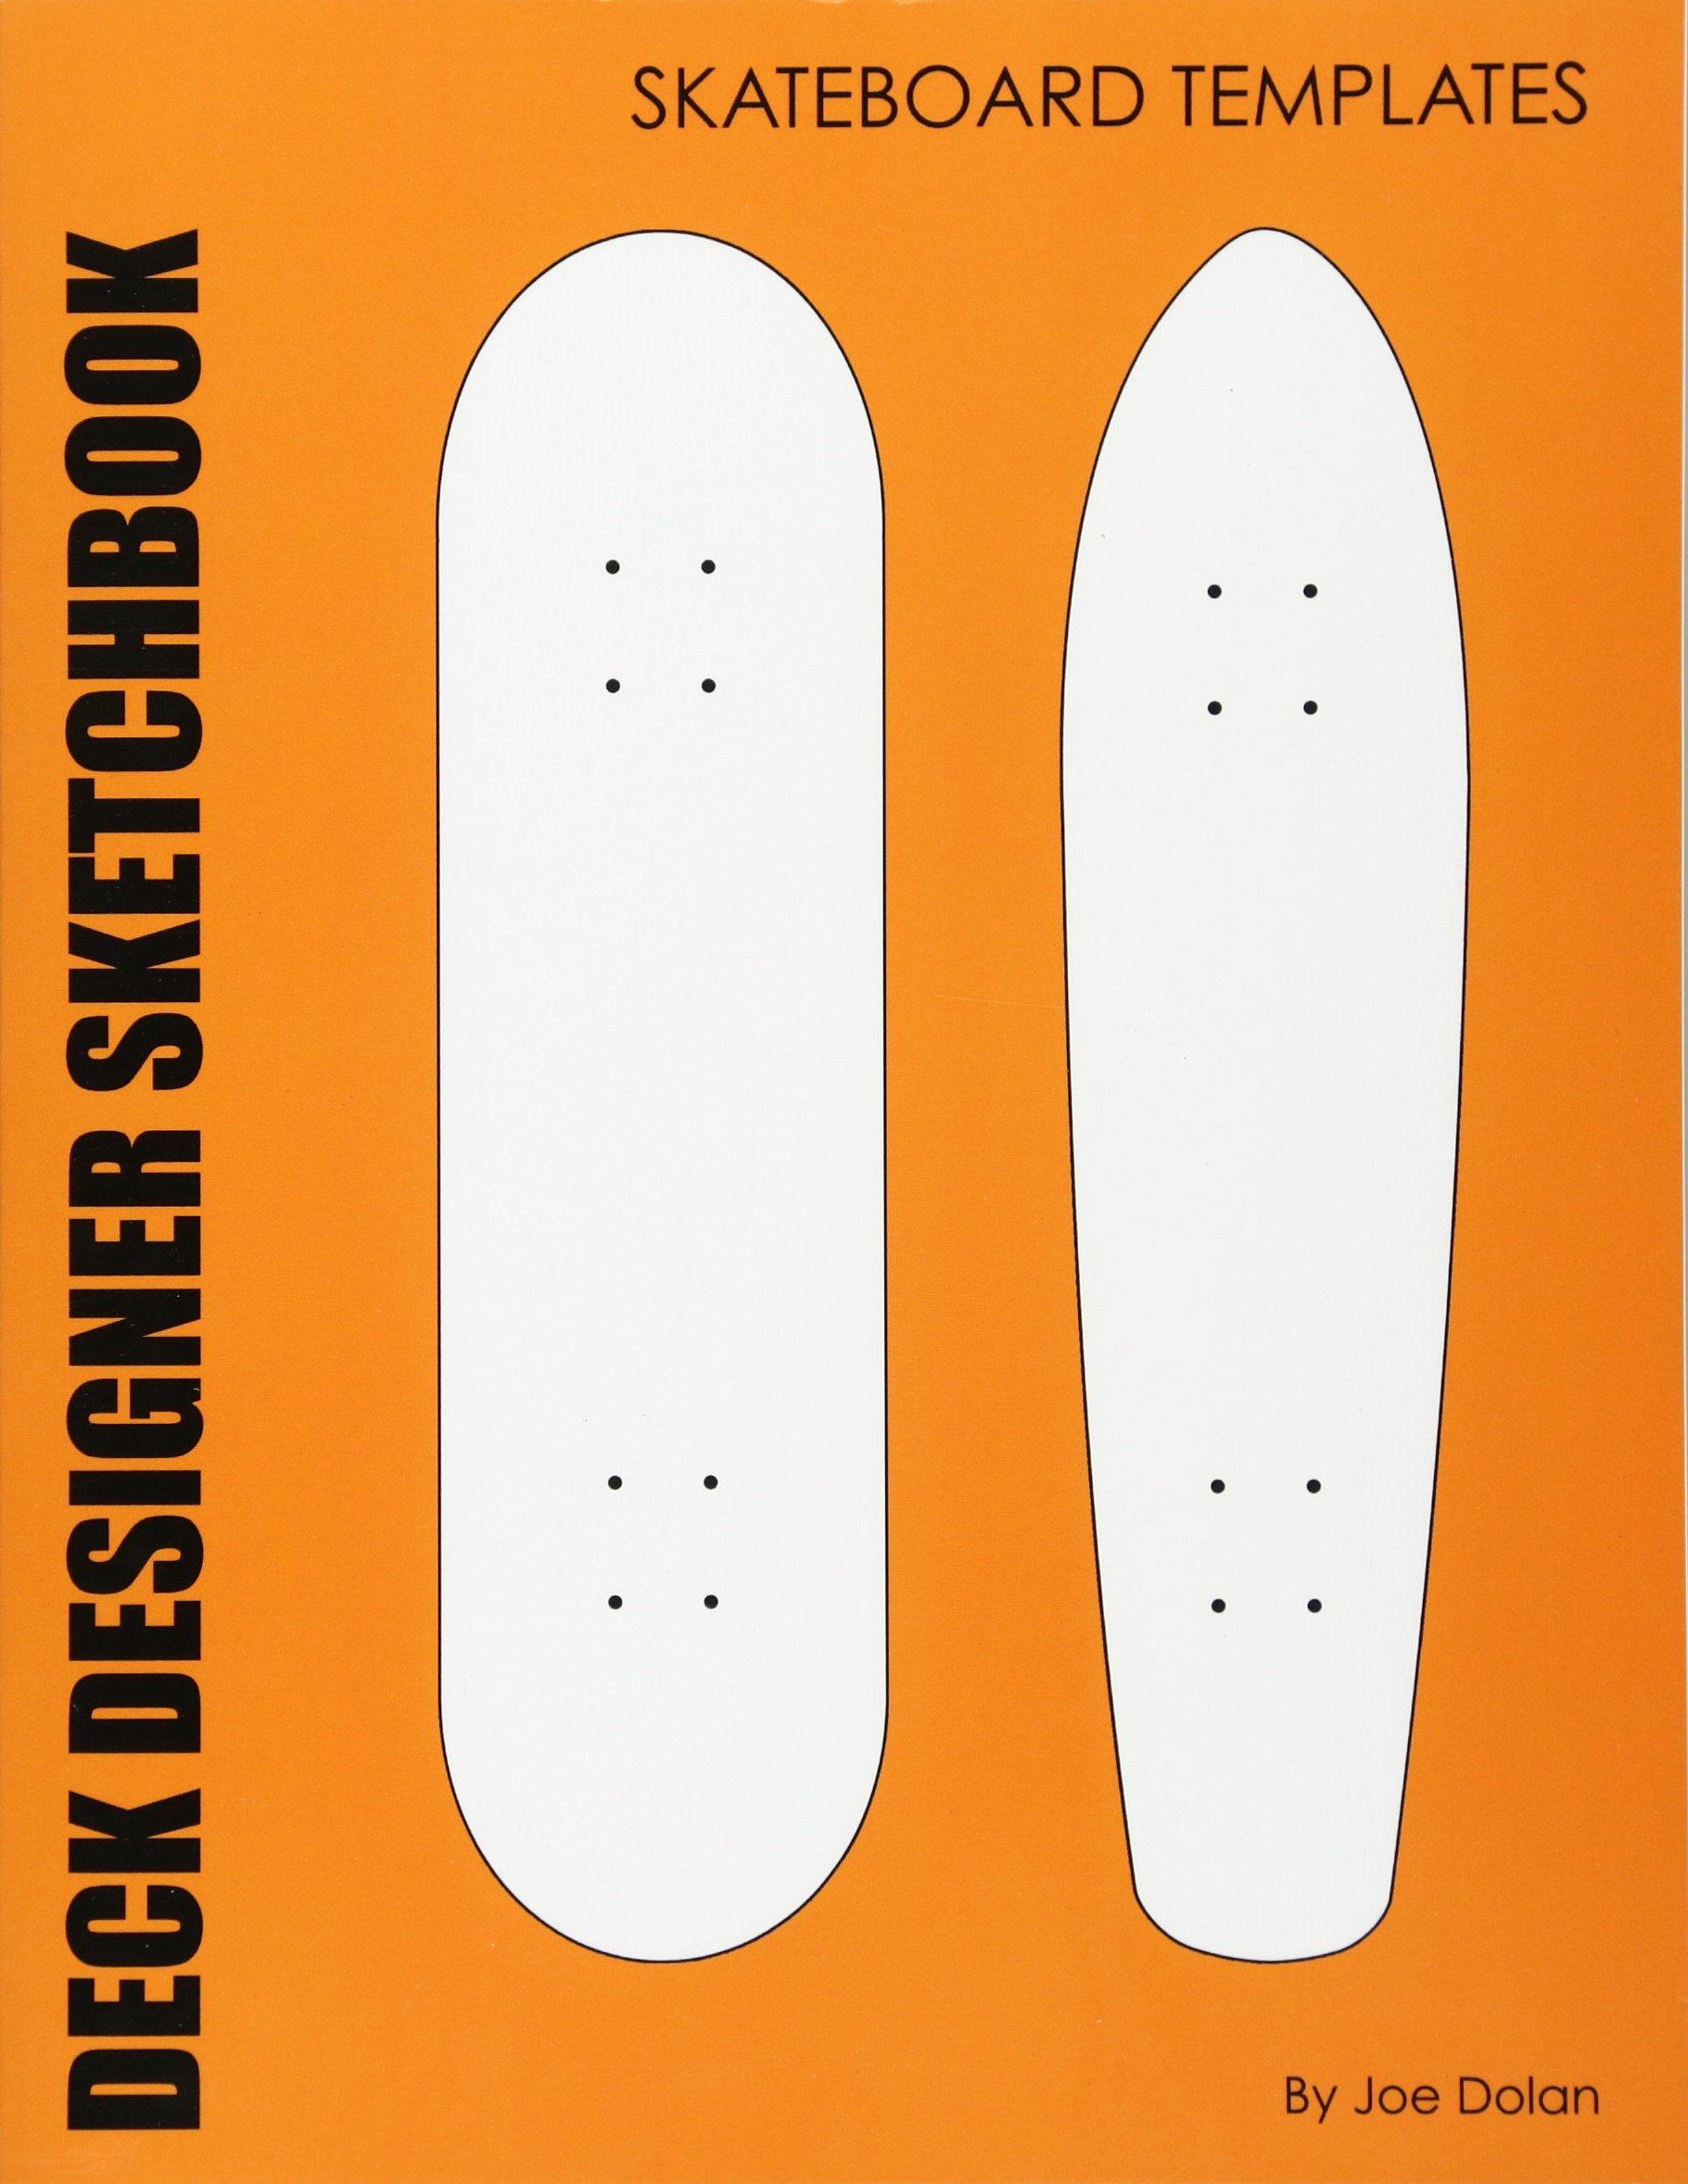 Deck designer sketchbook skateboard templates 96 comp and old deck designer sketchbook skateboard templates 96 comp and old school skateboard deck templates joe dolan 9781468018844 amazon books maxwellsz